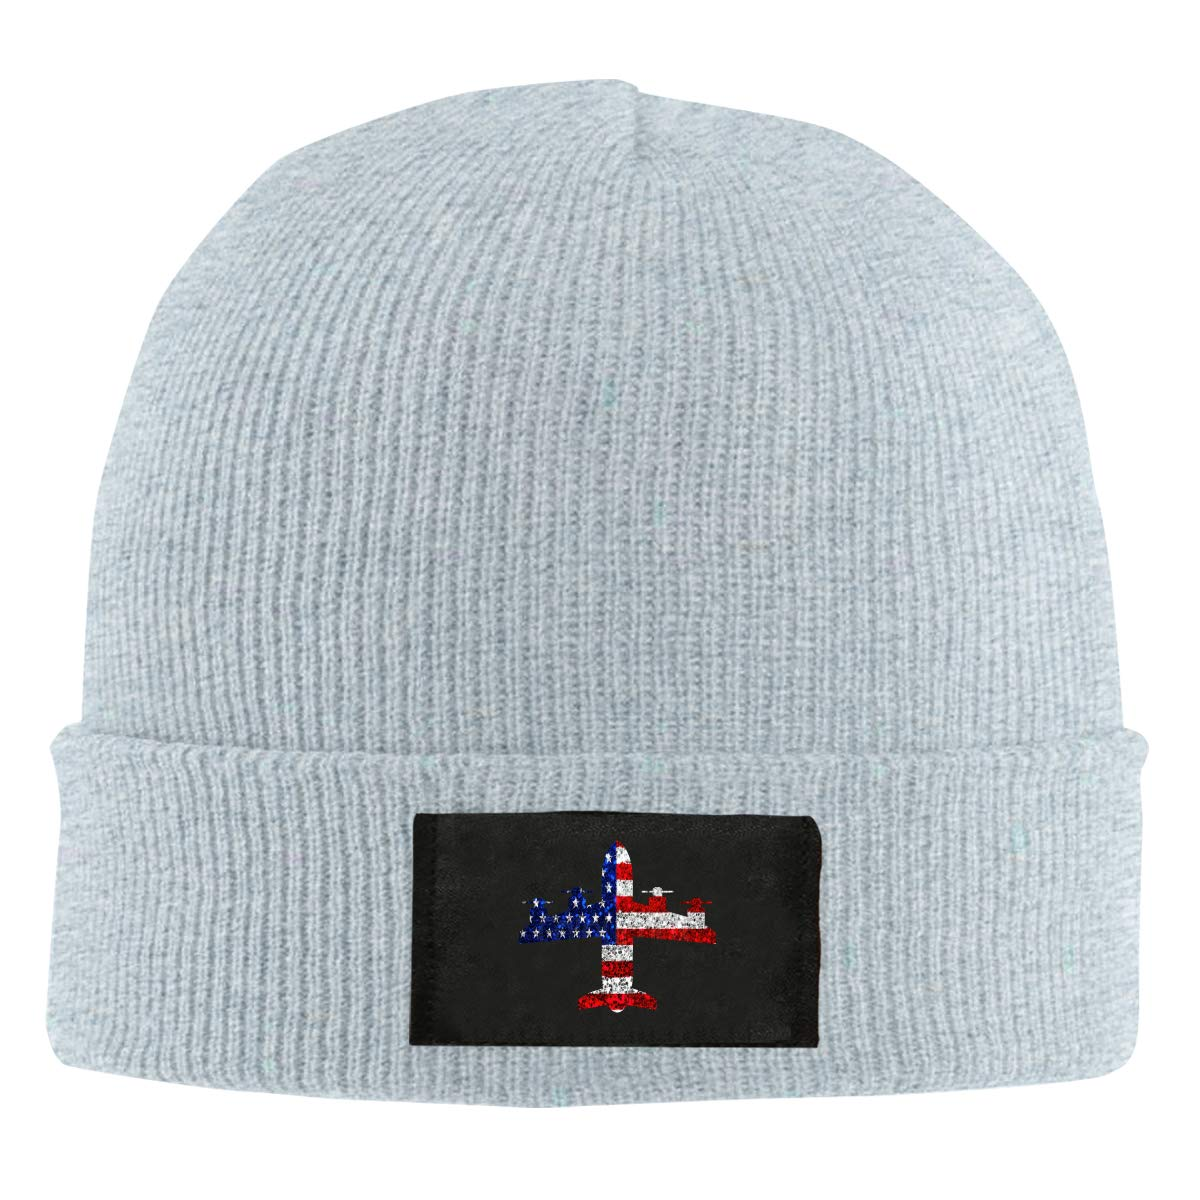 LRHUI Airplane American Flag Winter Knitted Hat Warm Wool Skull Beanie Cap